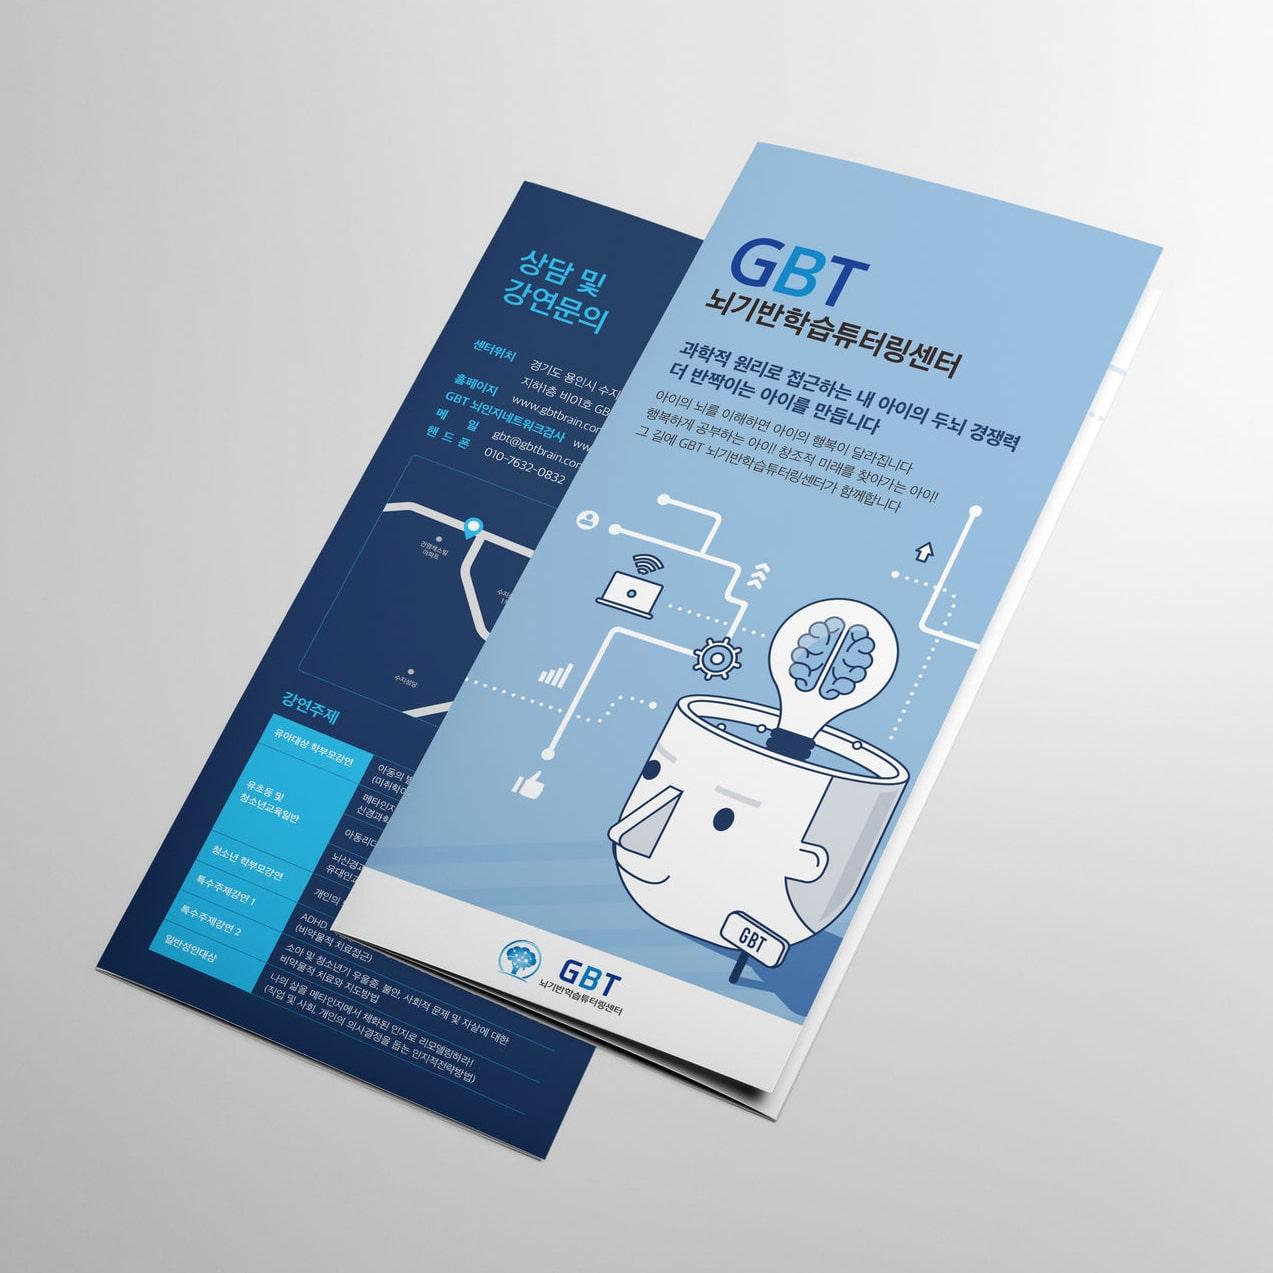 GBT 뇌기반학습튜터링센터 리플렛 디자인 시안 - GBT